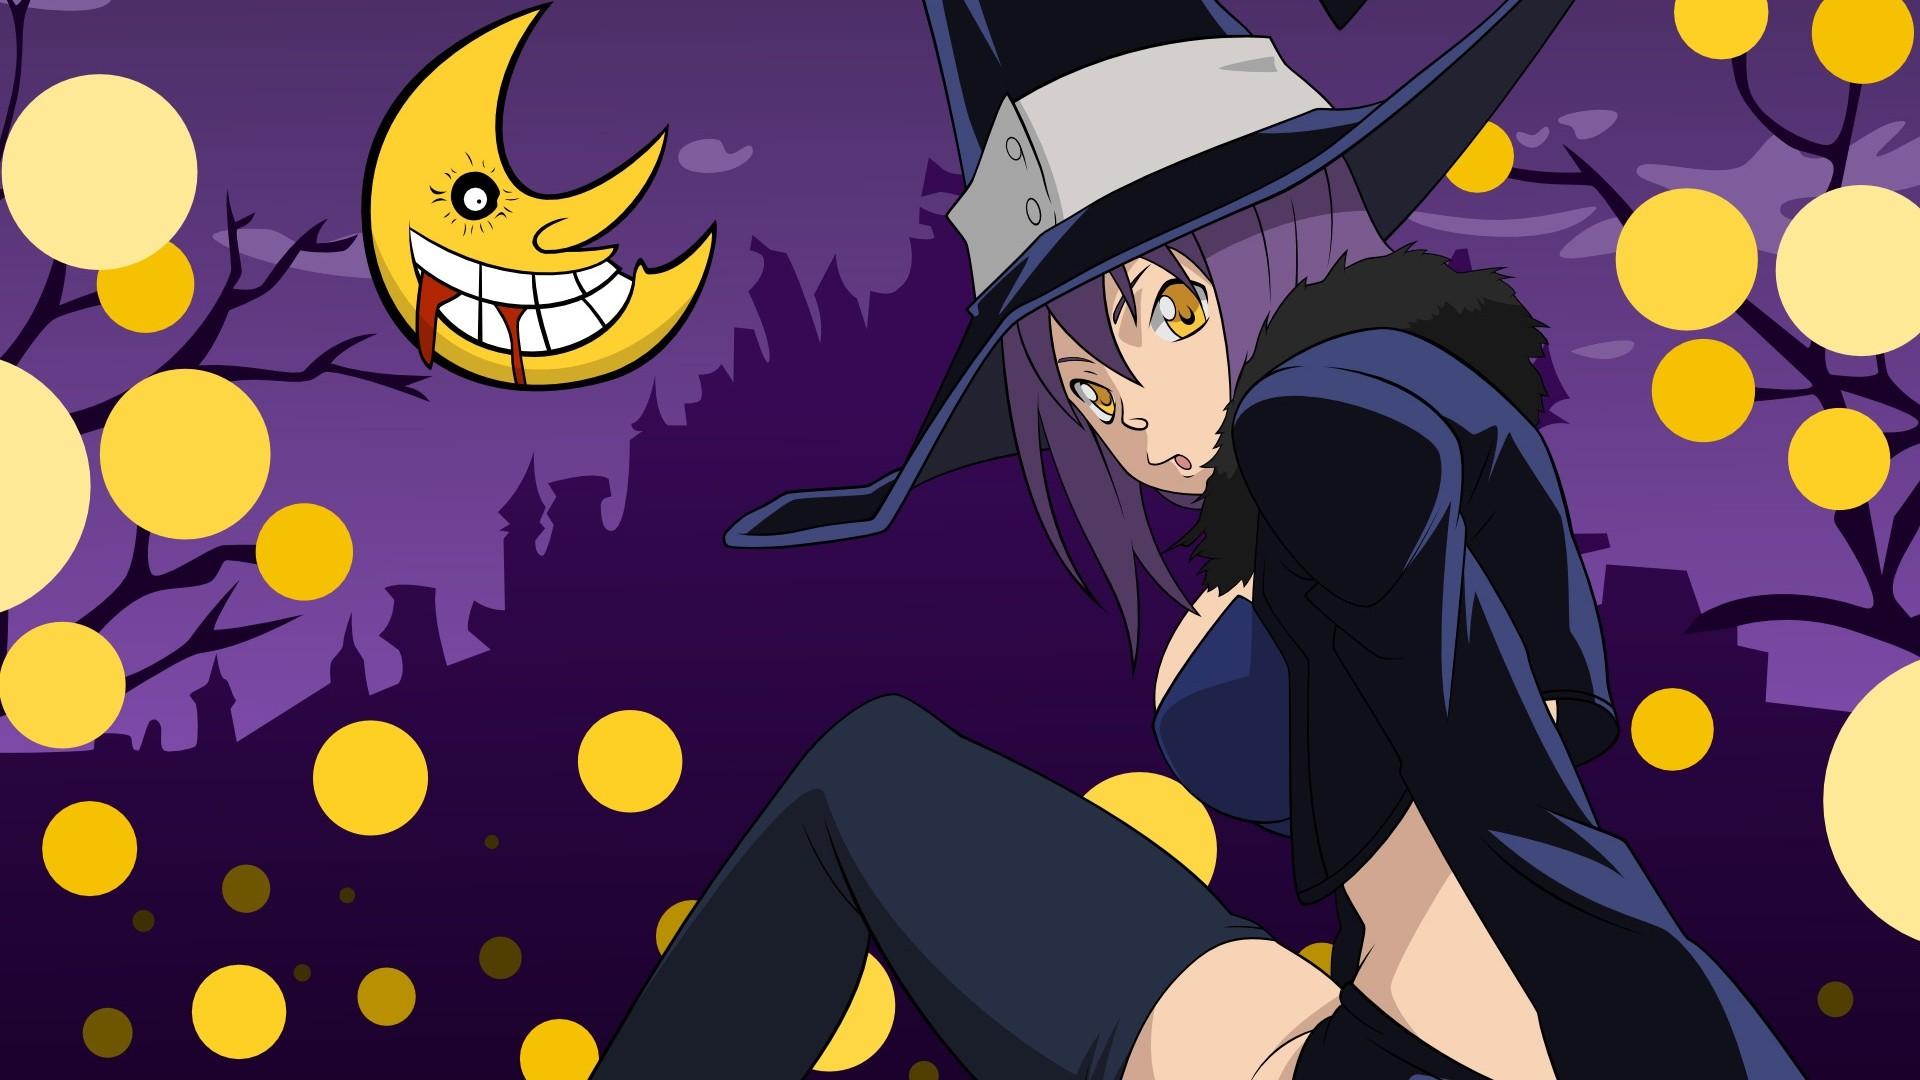 … Anime Halloween Wallpaper (03) …